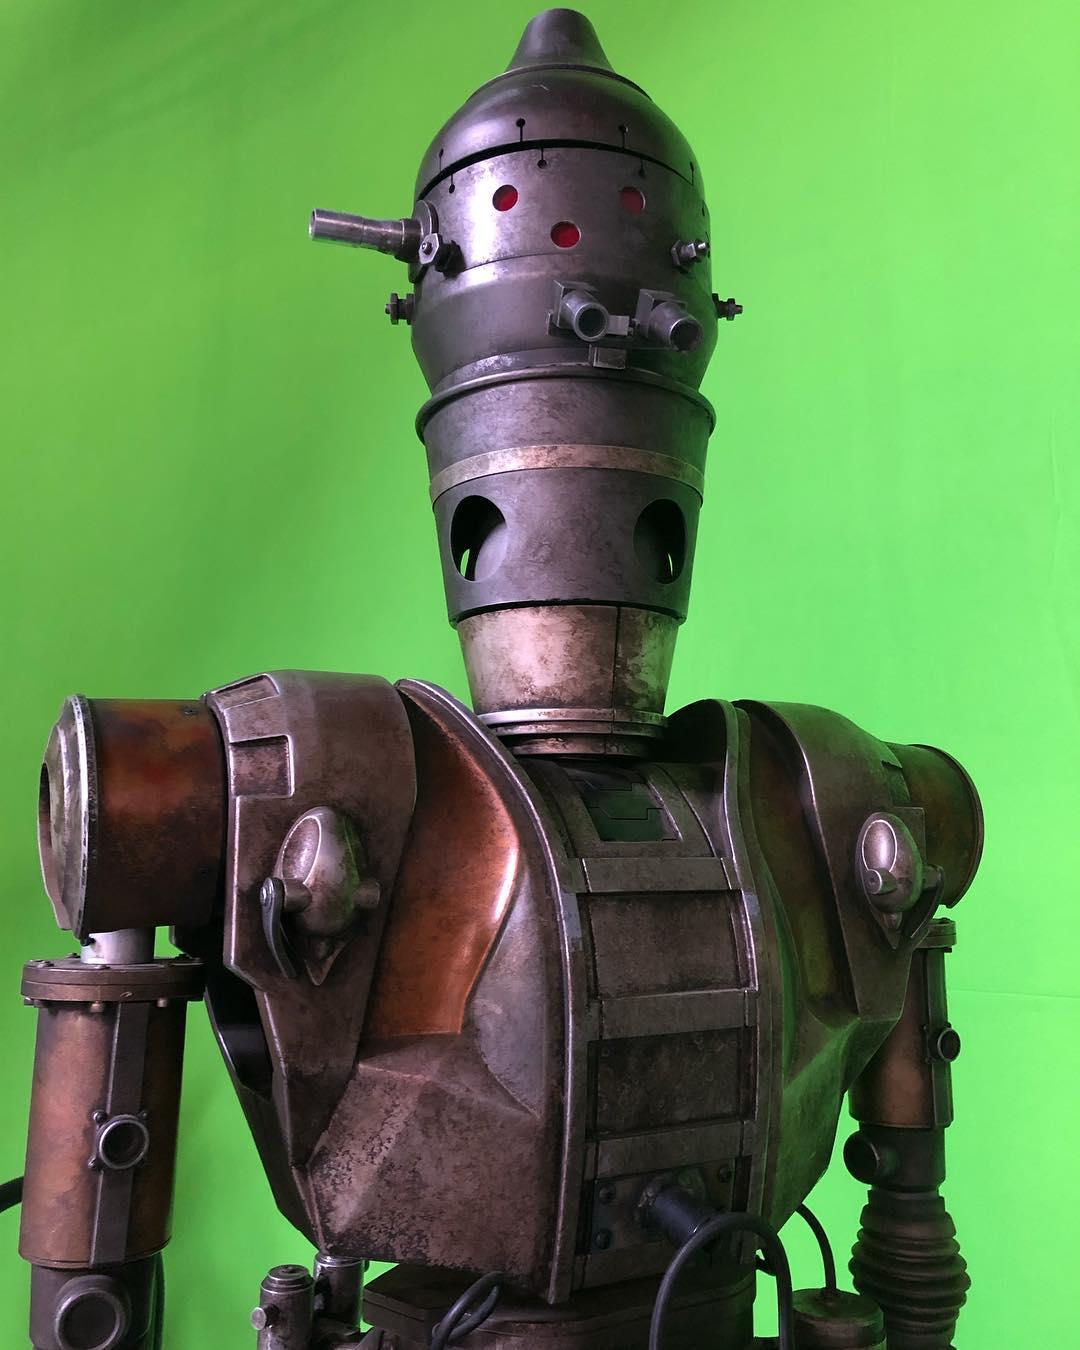 Jon Favreau Shares Bounty Hunter Image From Star Wars  Cosmic Book News